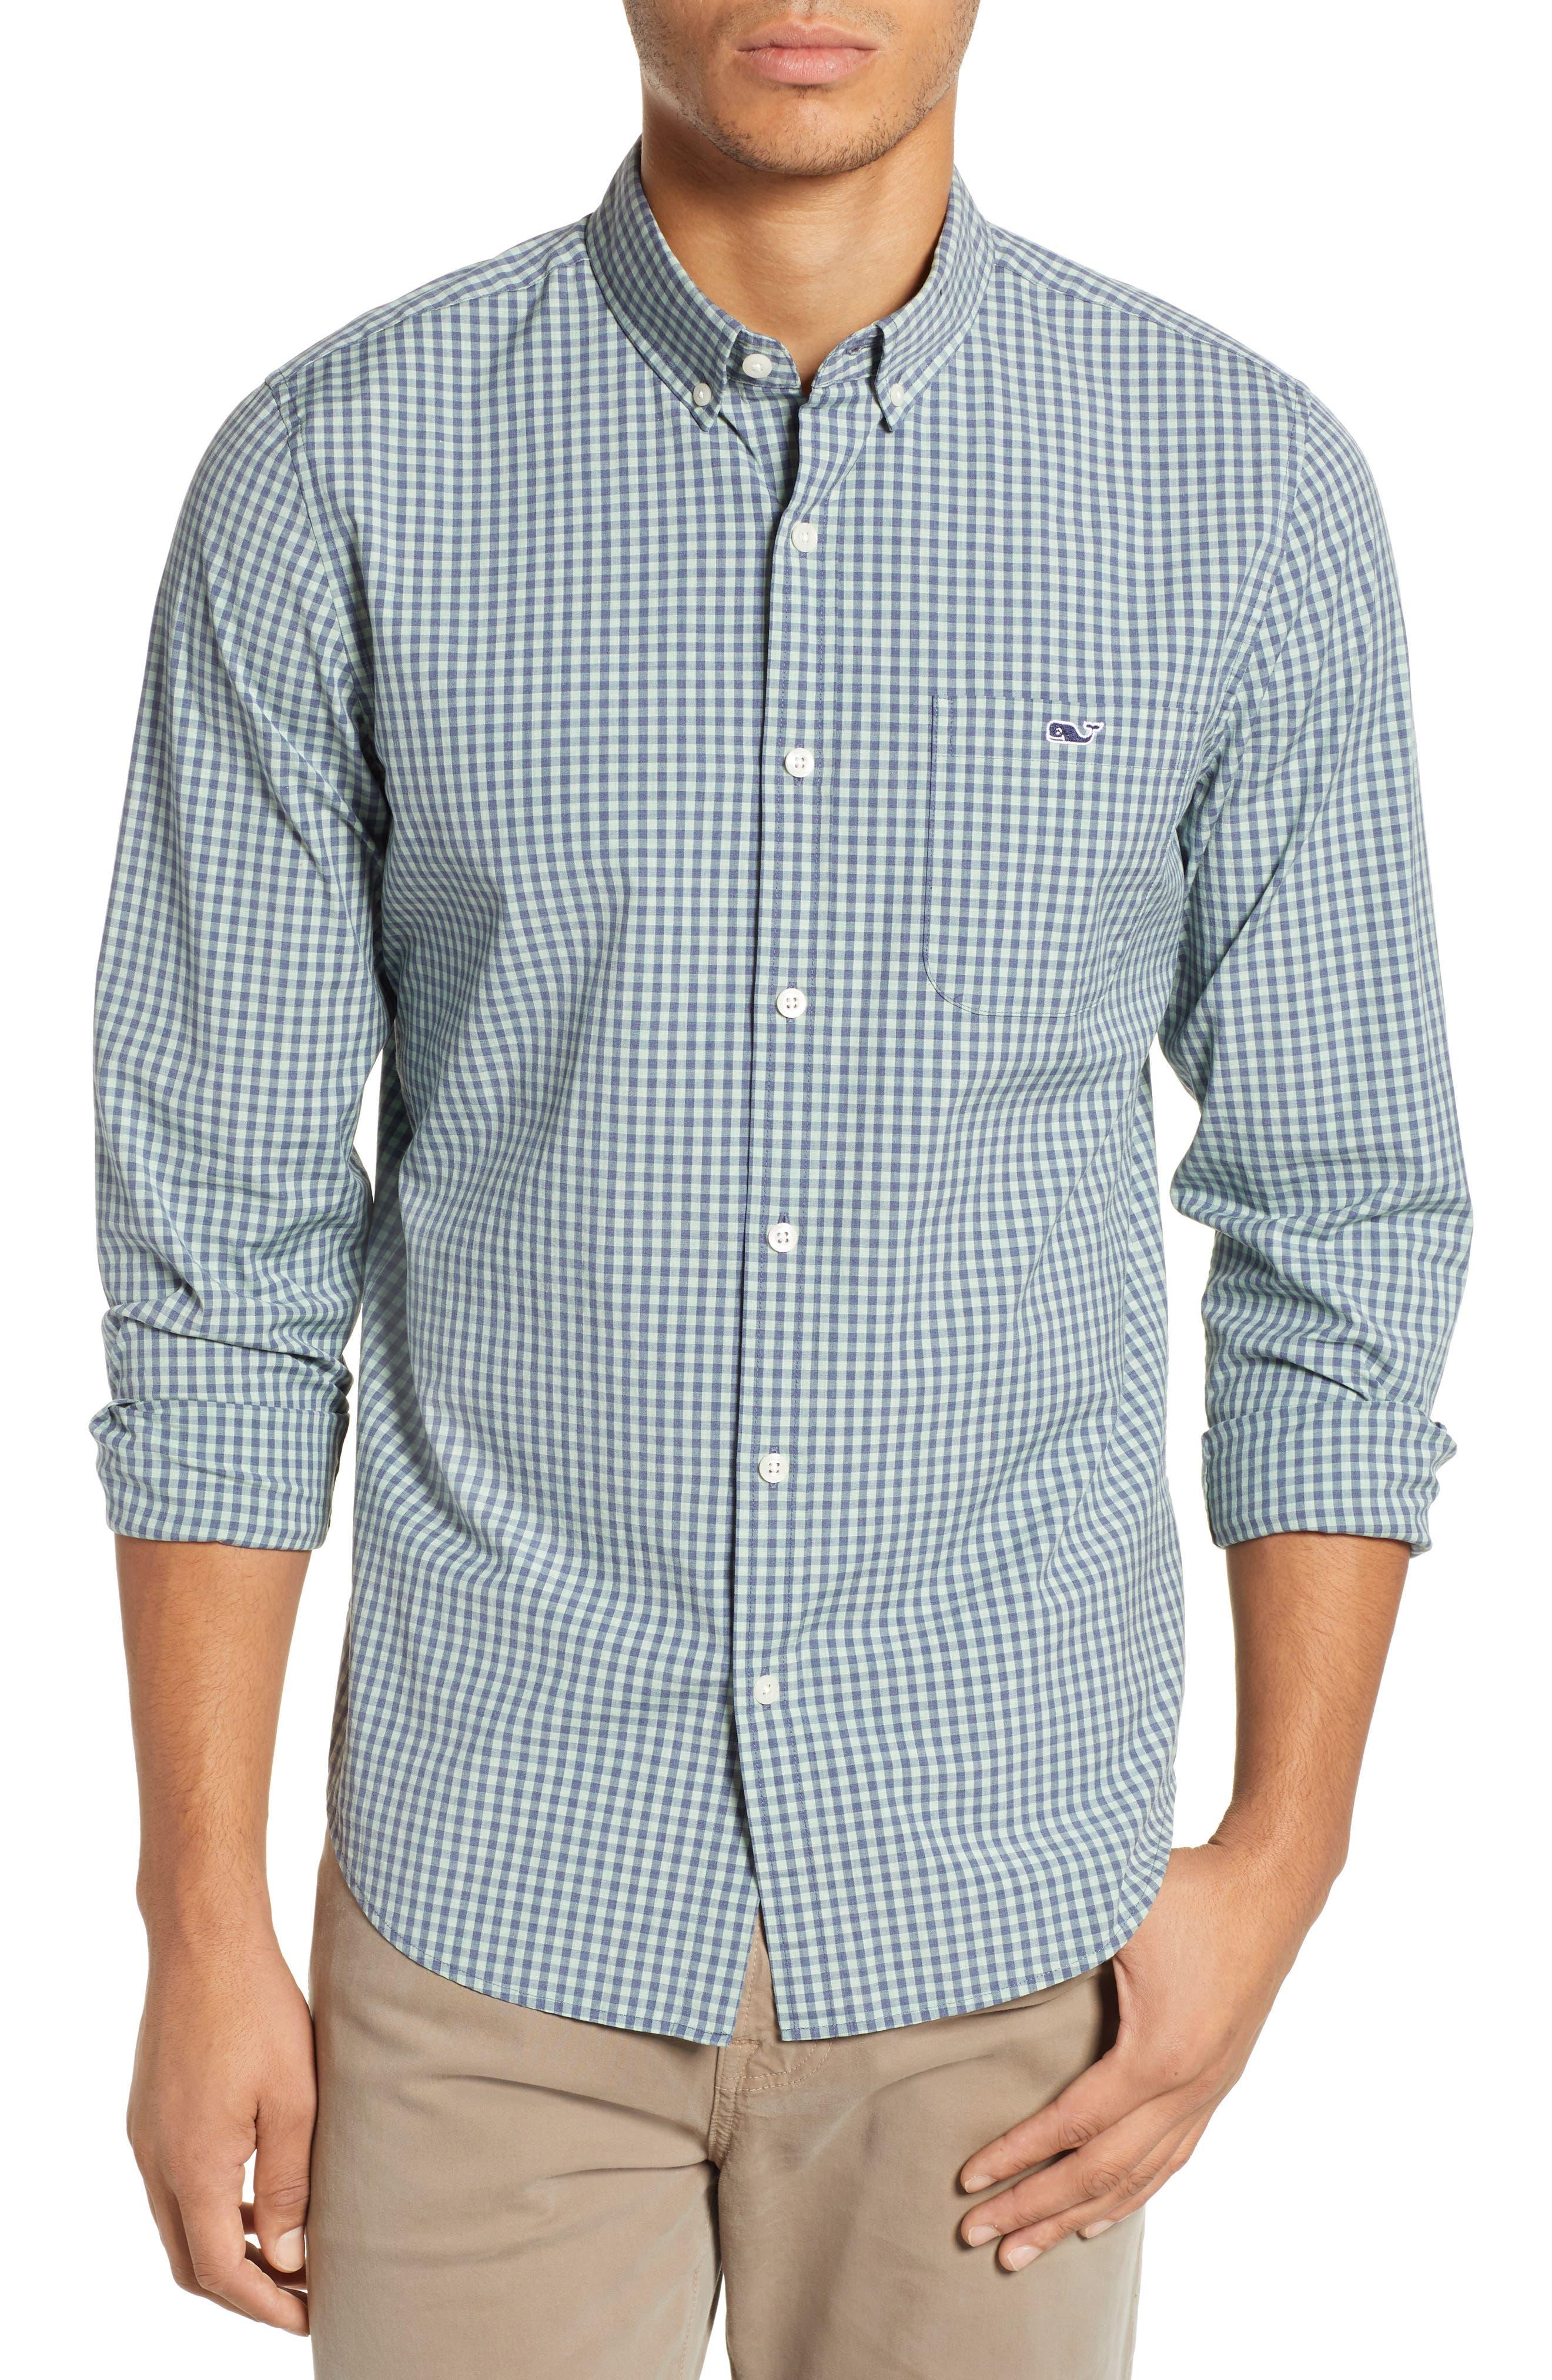 VINEYARD VINES Gingham Check Sport Shirt, Main, color, 362